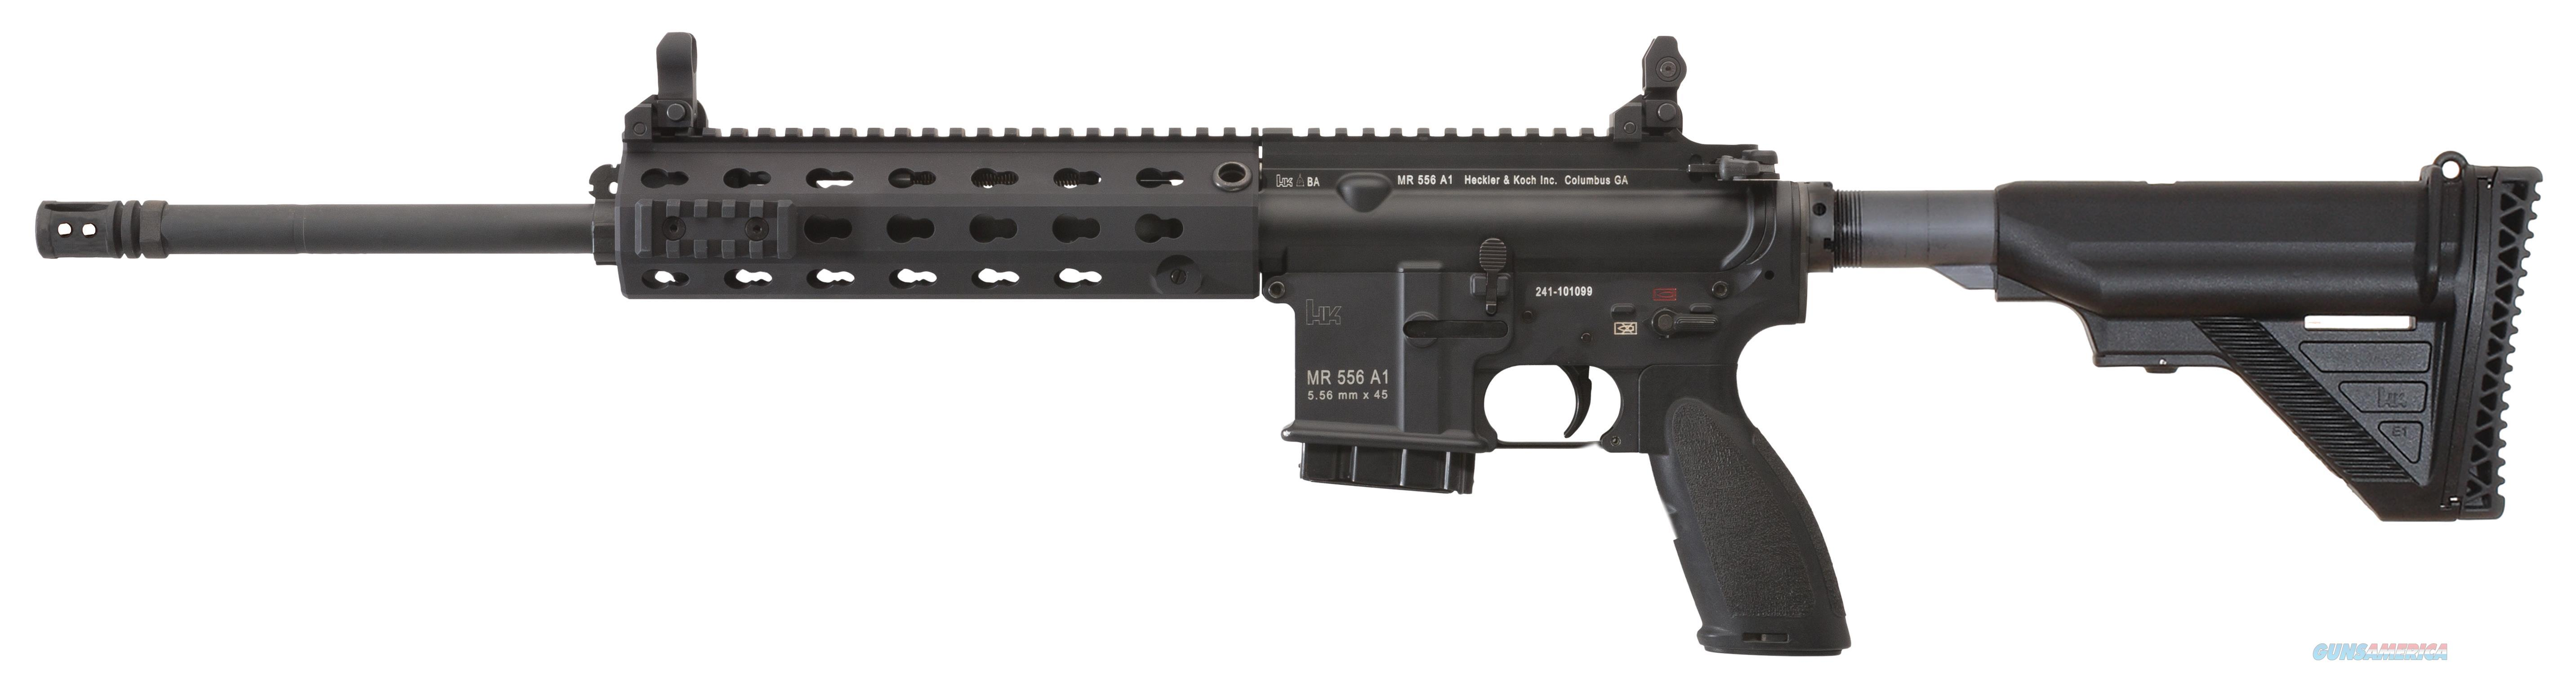 "Heckler & Koch Mr556lca1 Mr556 A1 Semi-Automatic 223 Remington/5.56 Nato 16.5"" Mb 10+1 Adjustable Black Stk Black MR556LCA1  Guns > Rifles > H Misc Rifles"